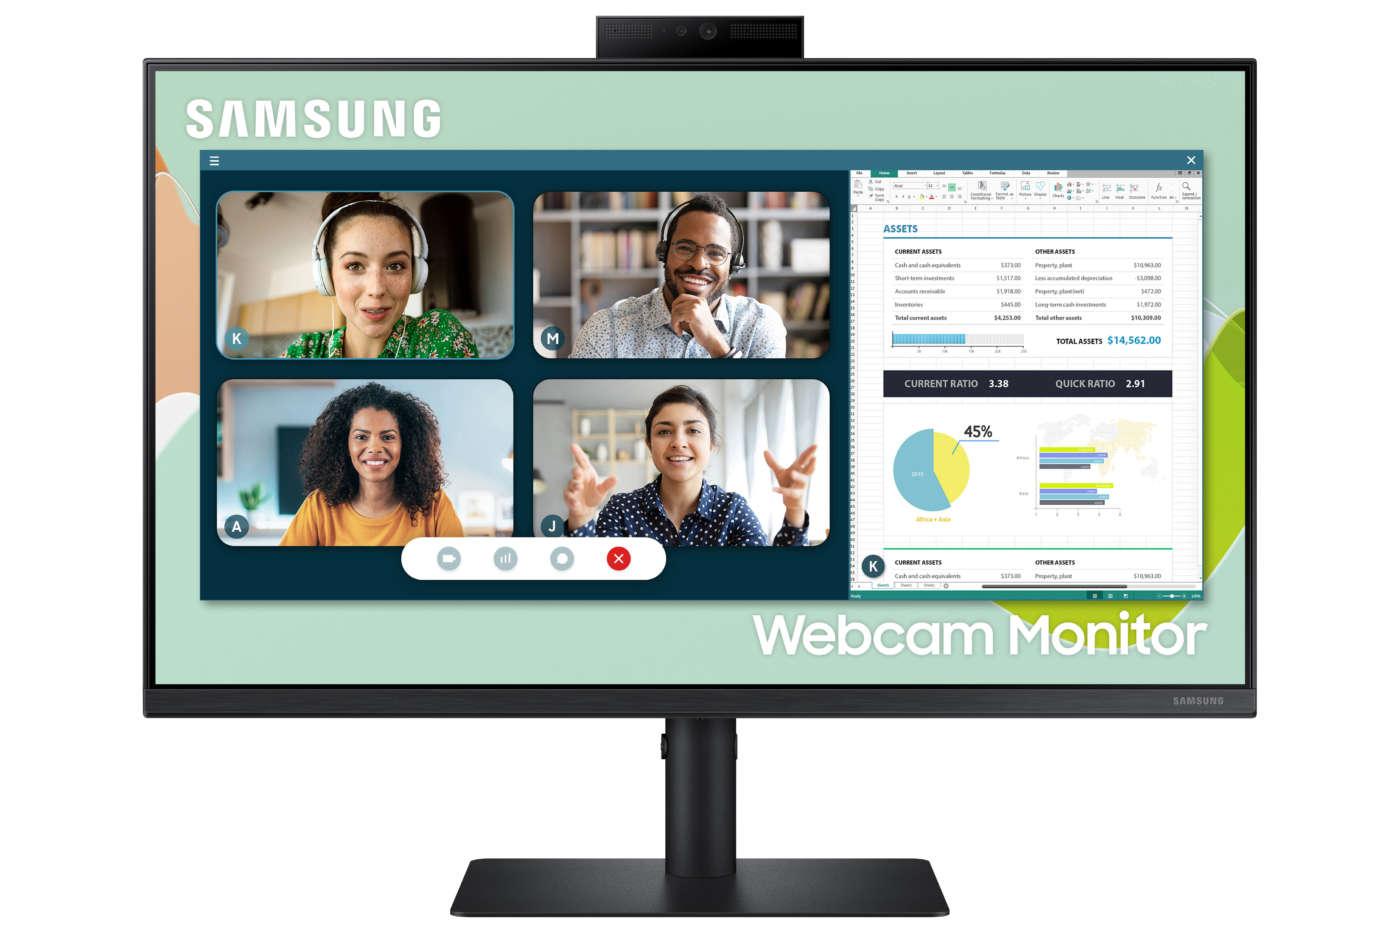 Webcam Monitor Samsung S4